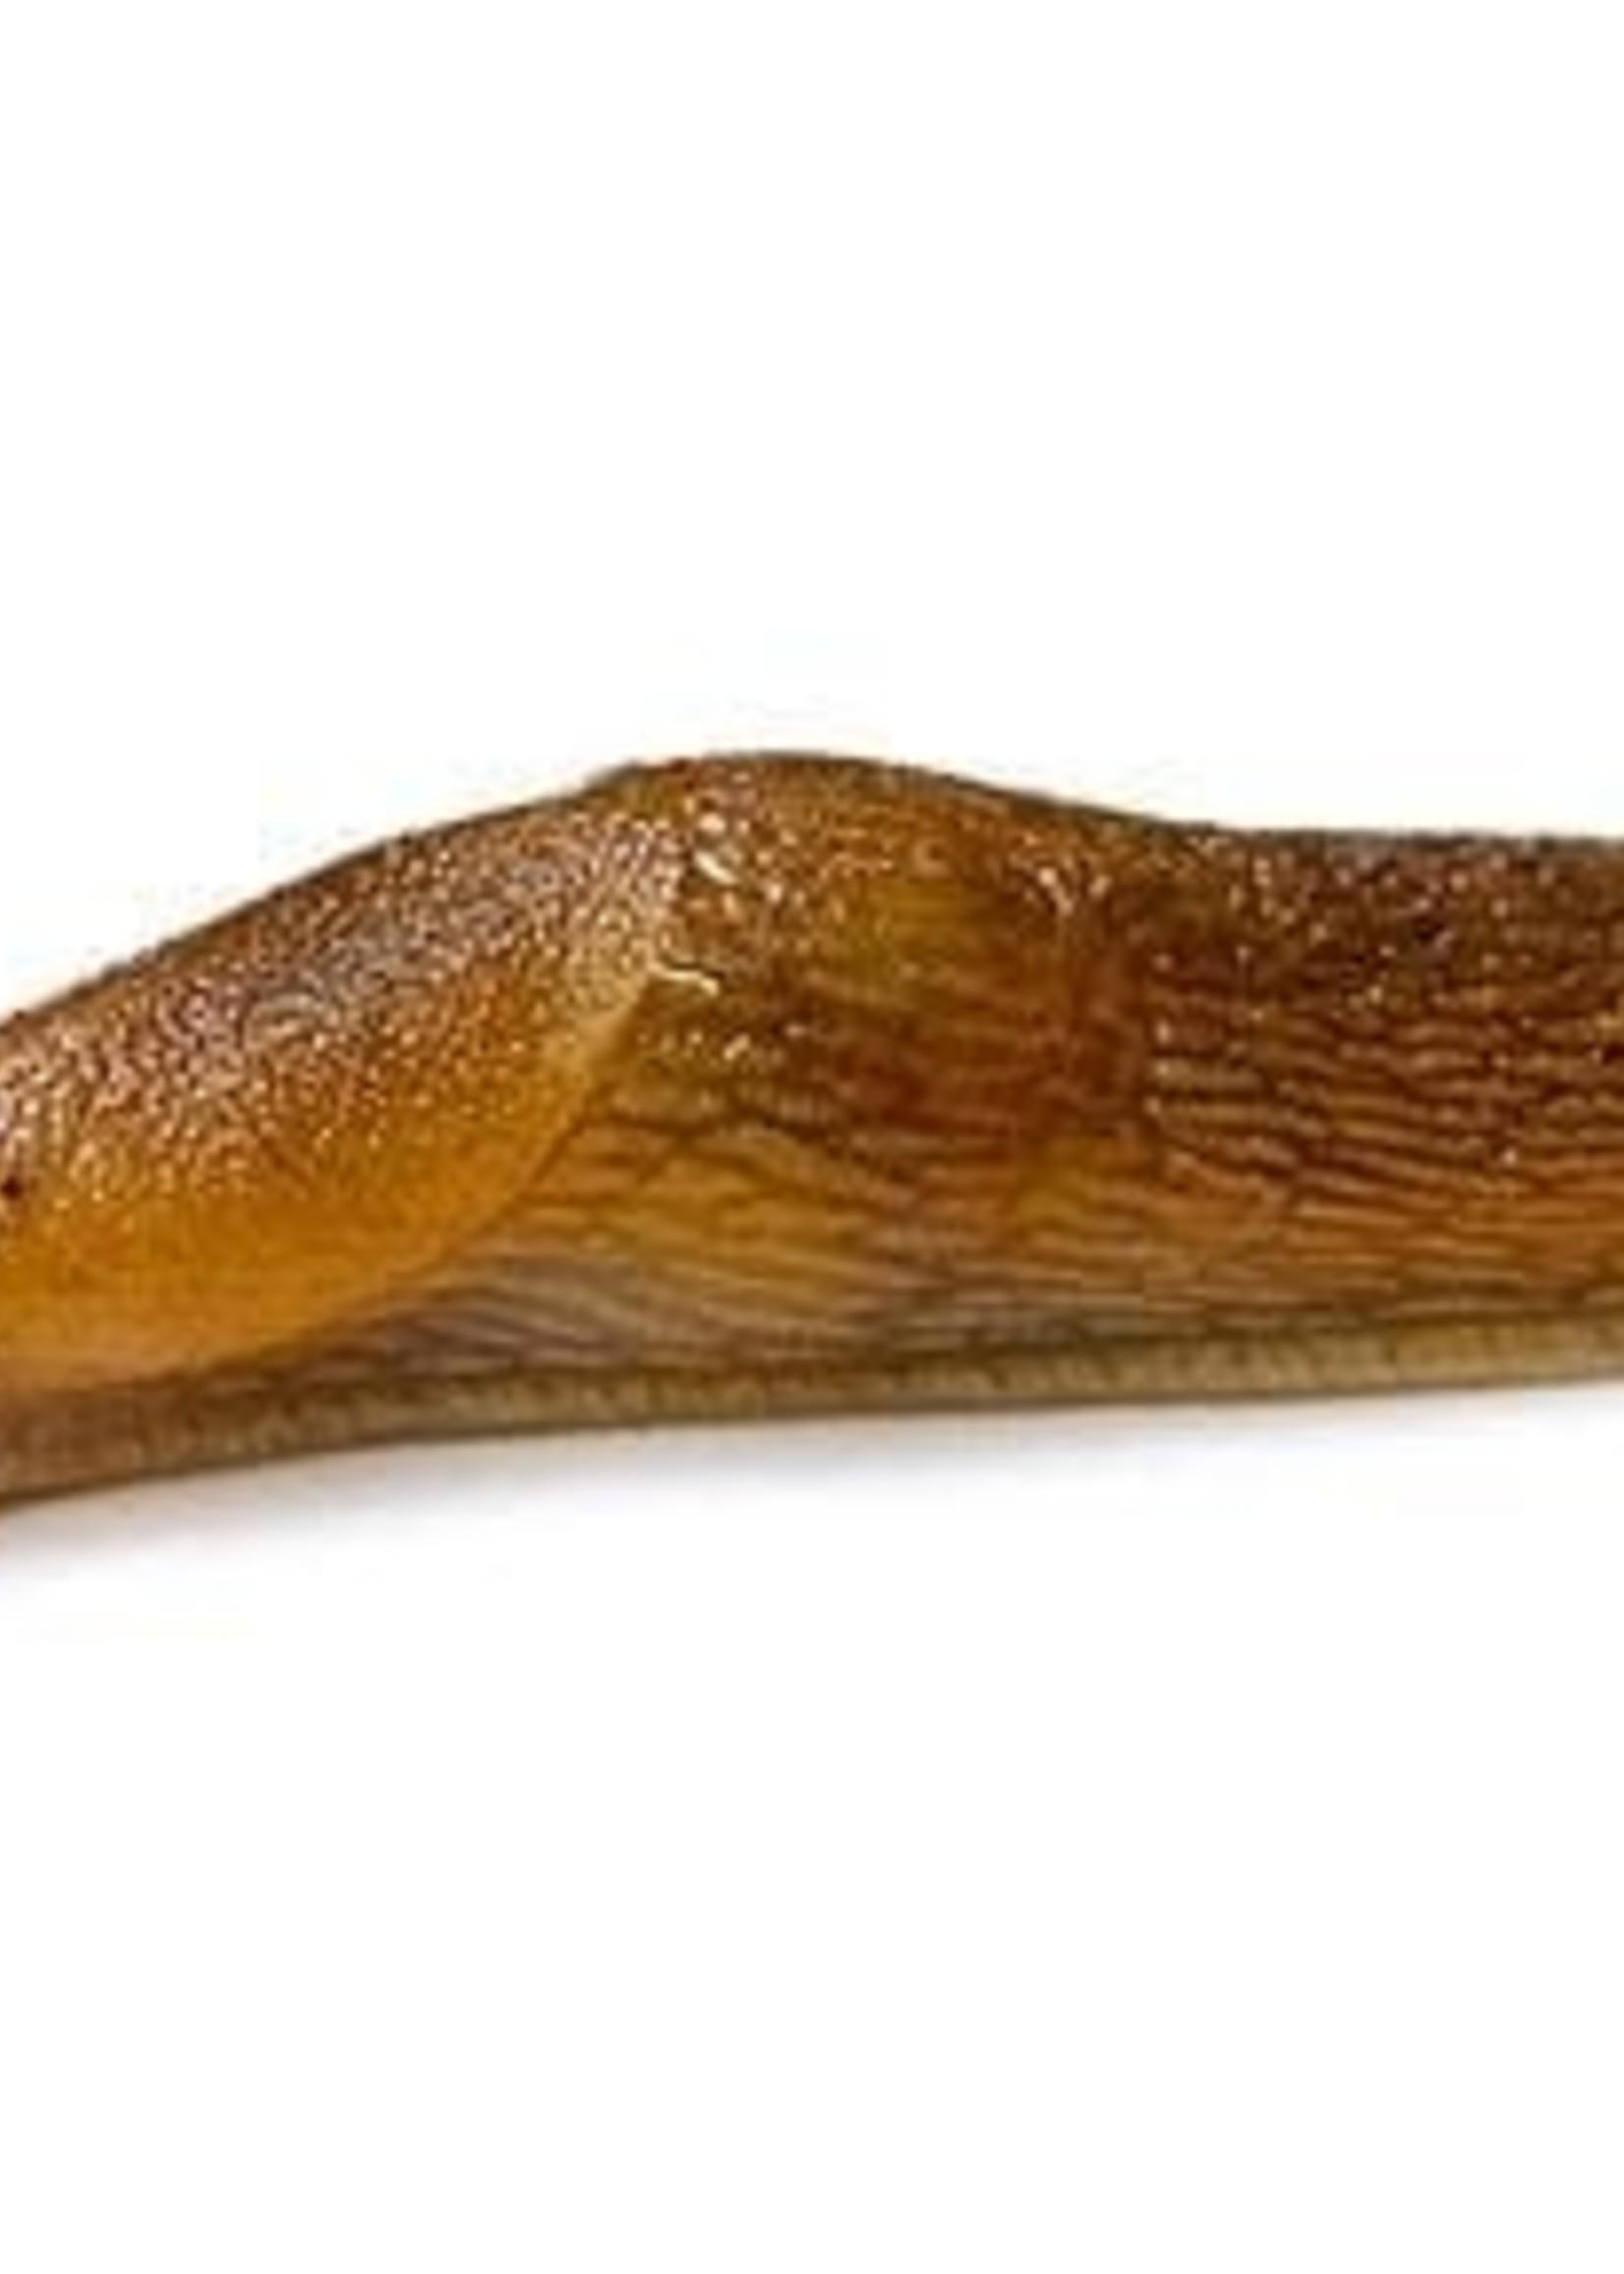 Insect, Slug